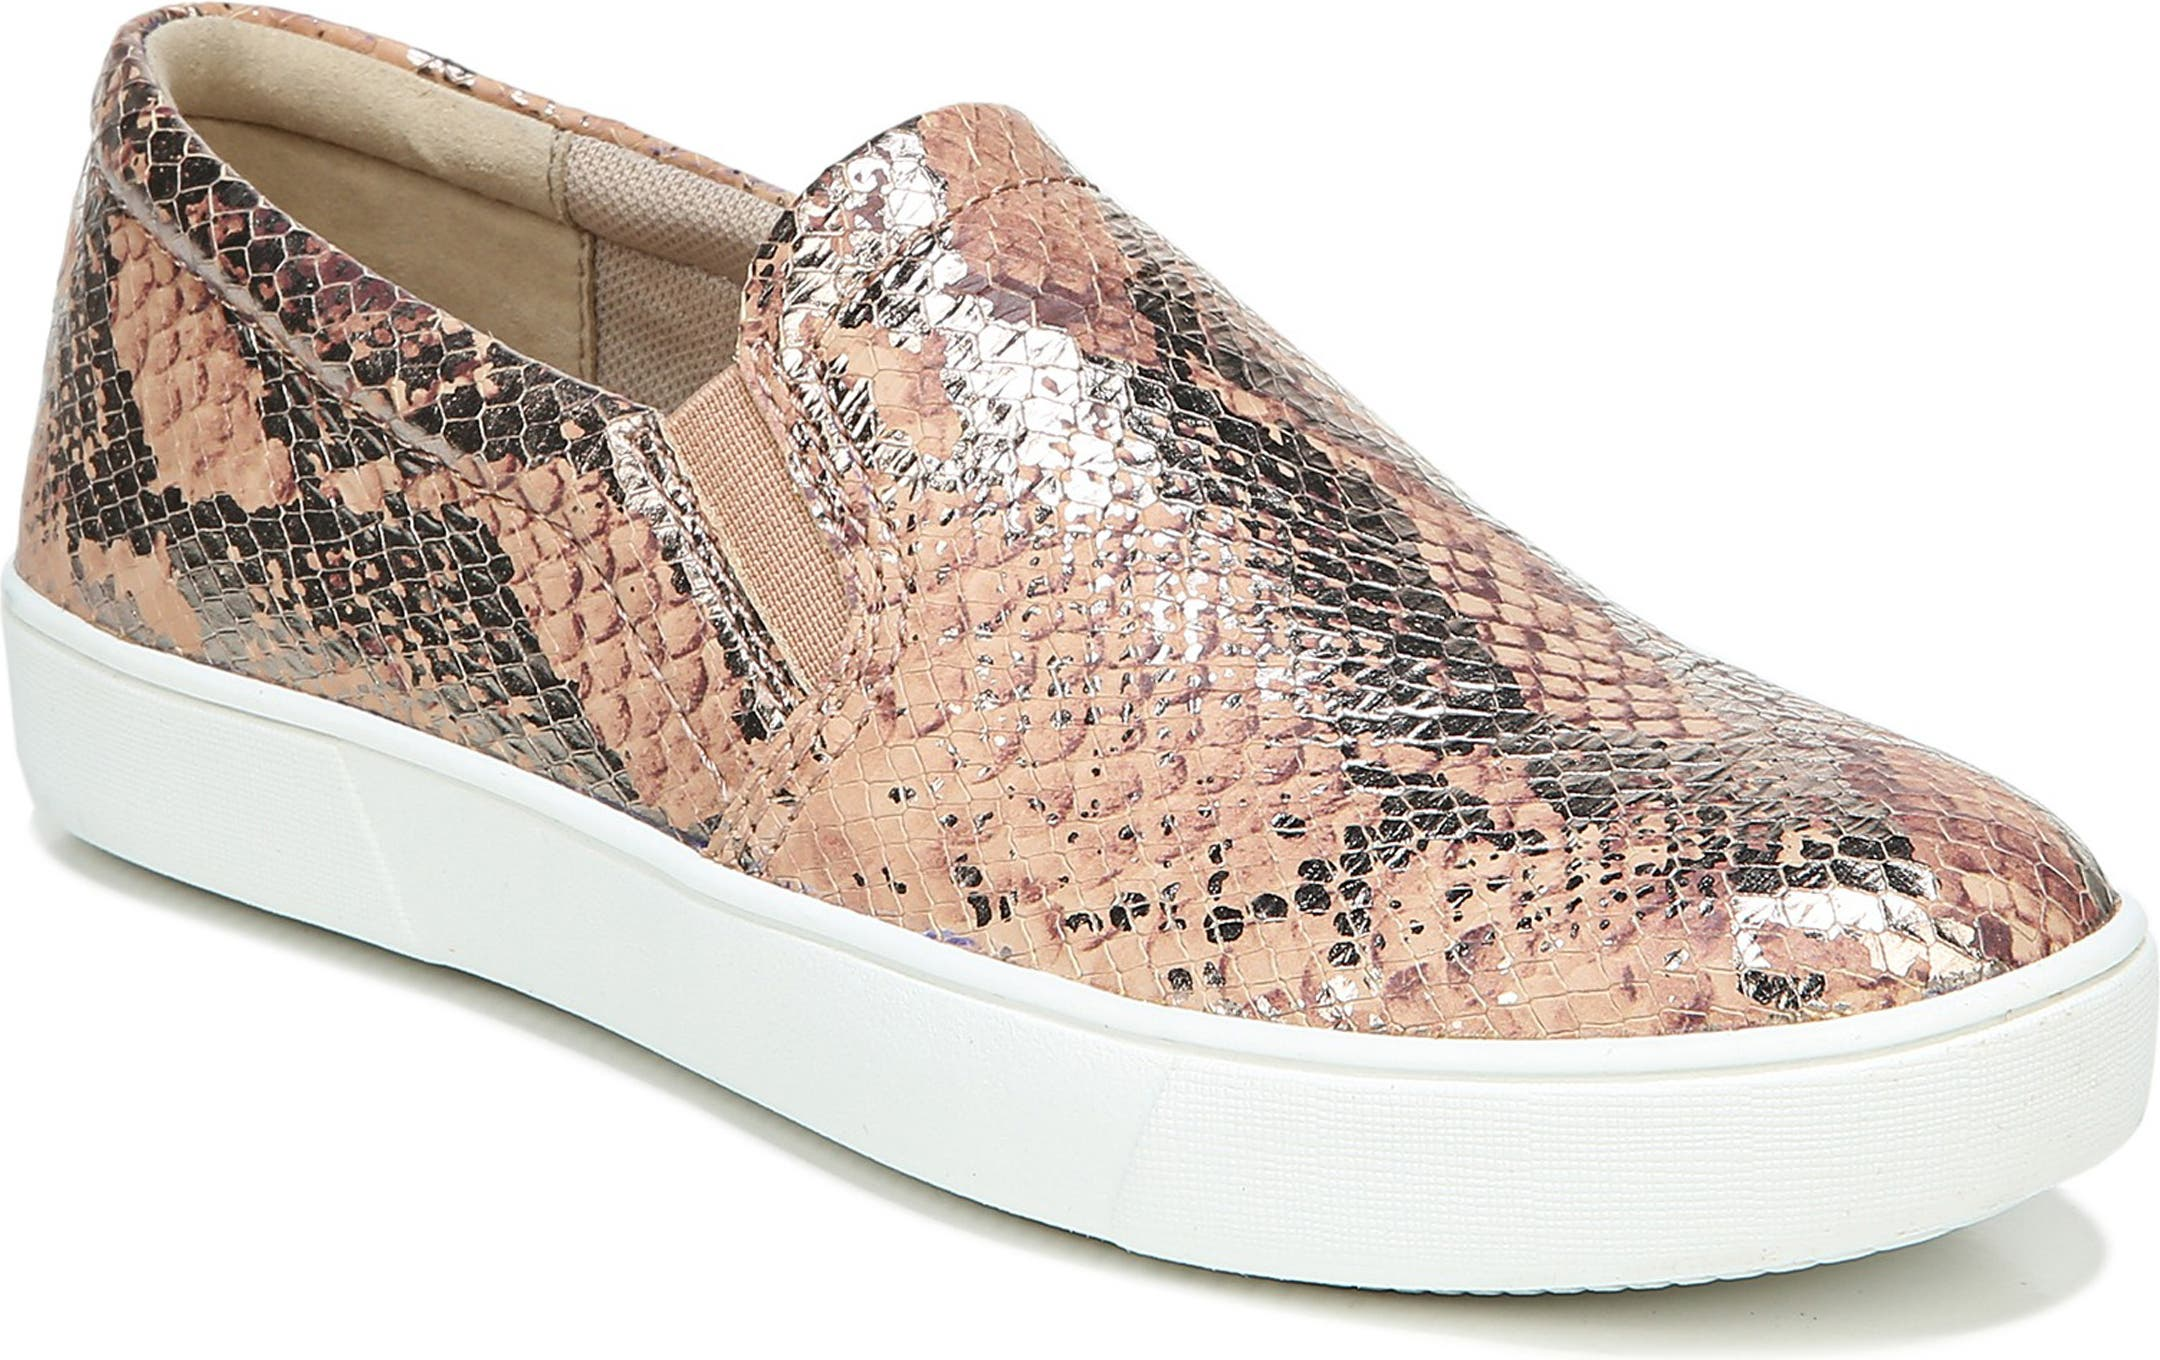 Naturalizer Womens Marianne Sneaker